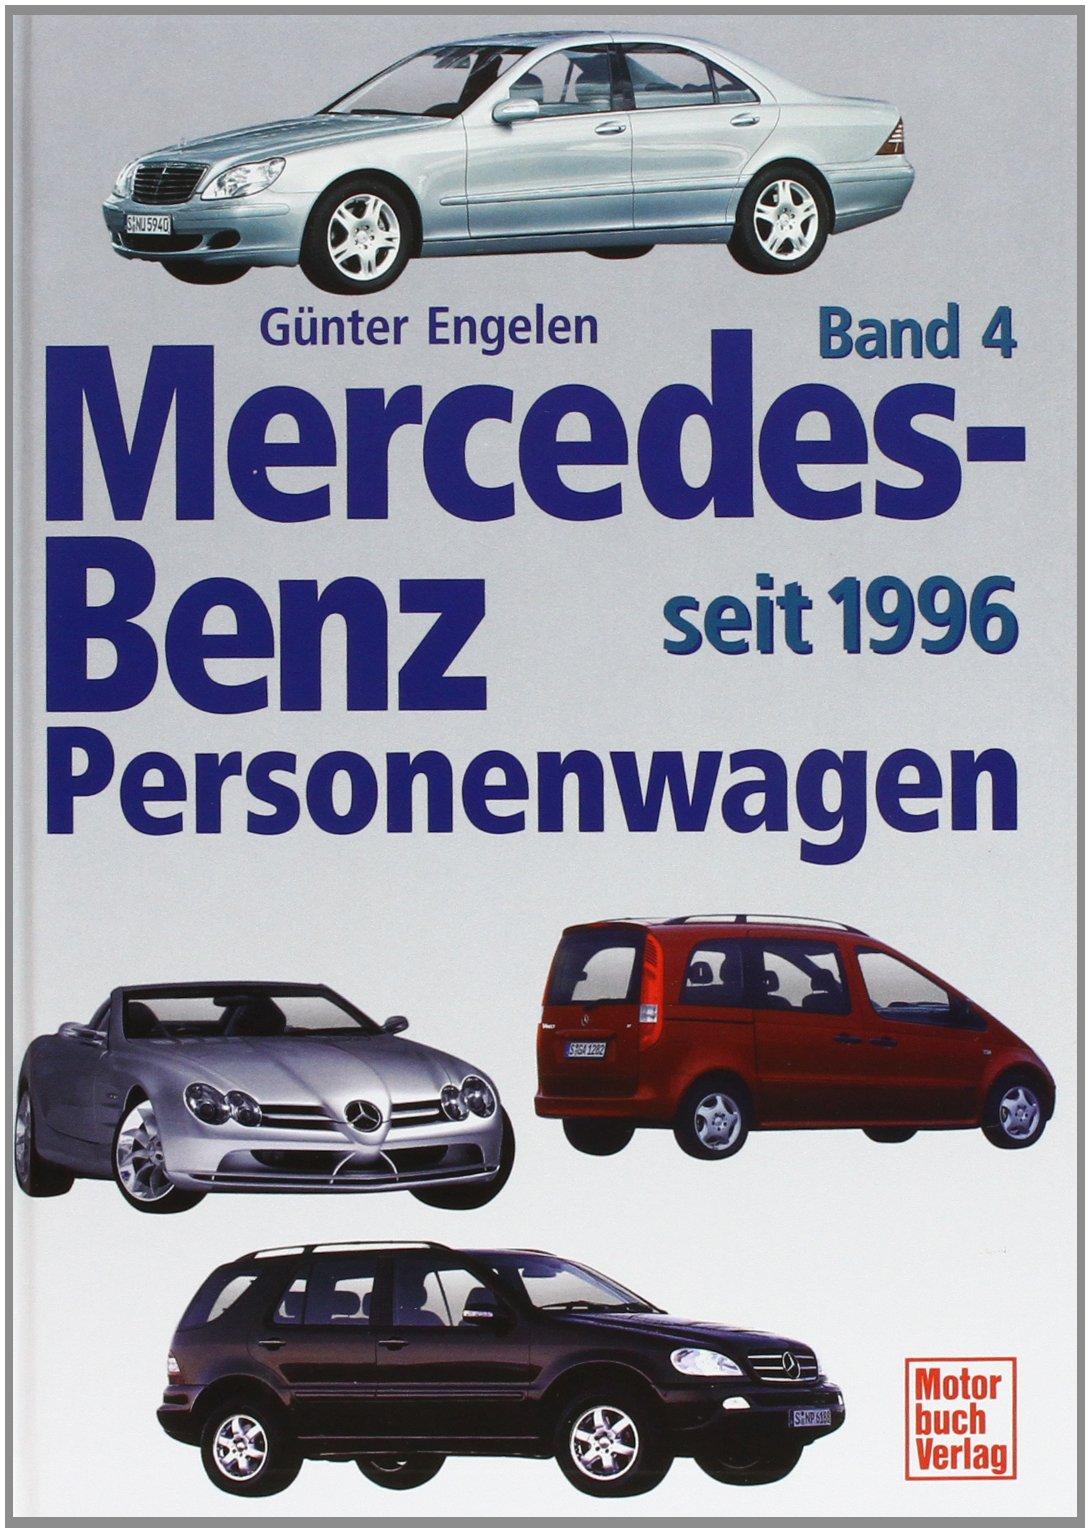 Mercedes-Benz Personenwagen 4. Seit 1996: G�nter Engelen: 9783613023482:  Amazon.com: Books